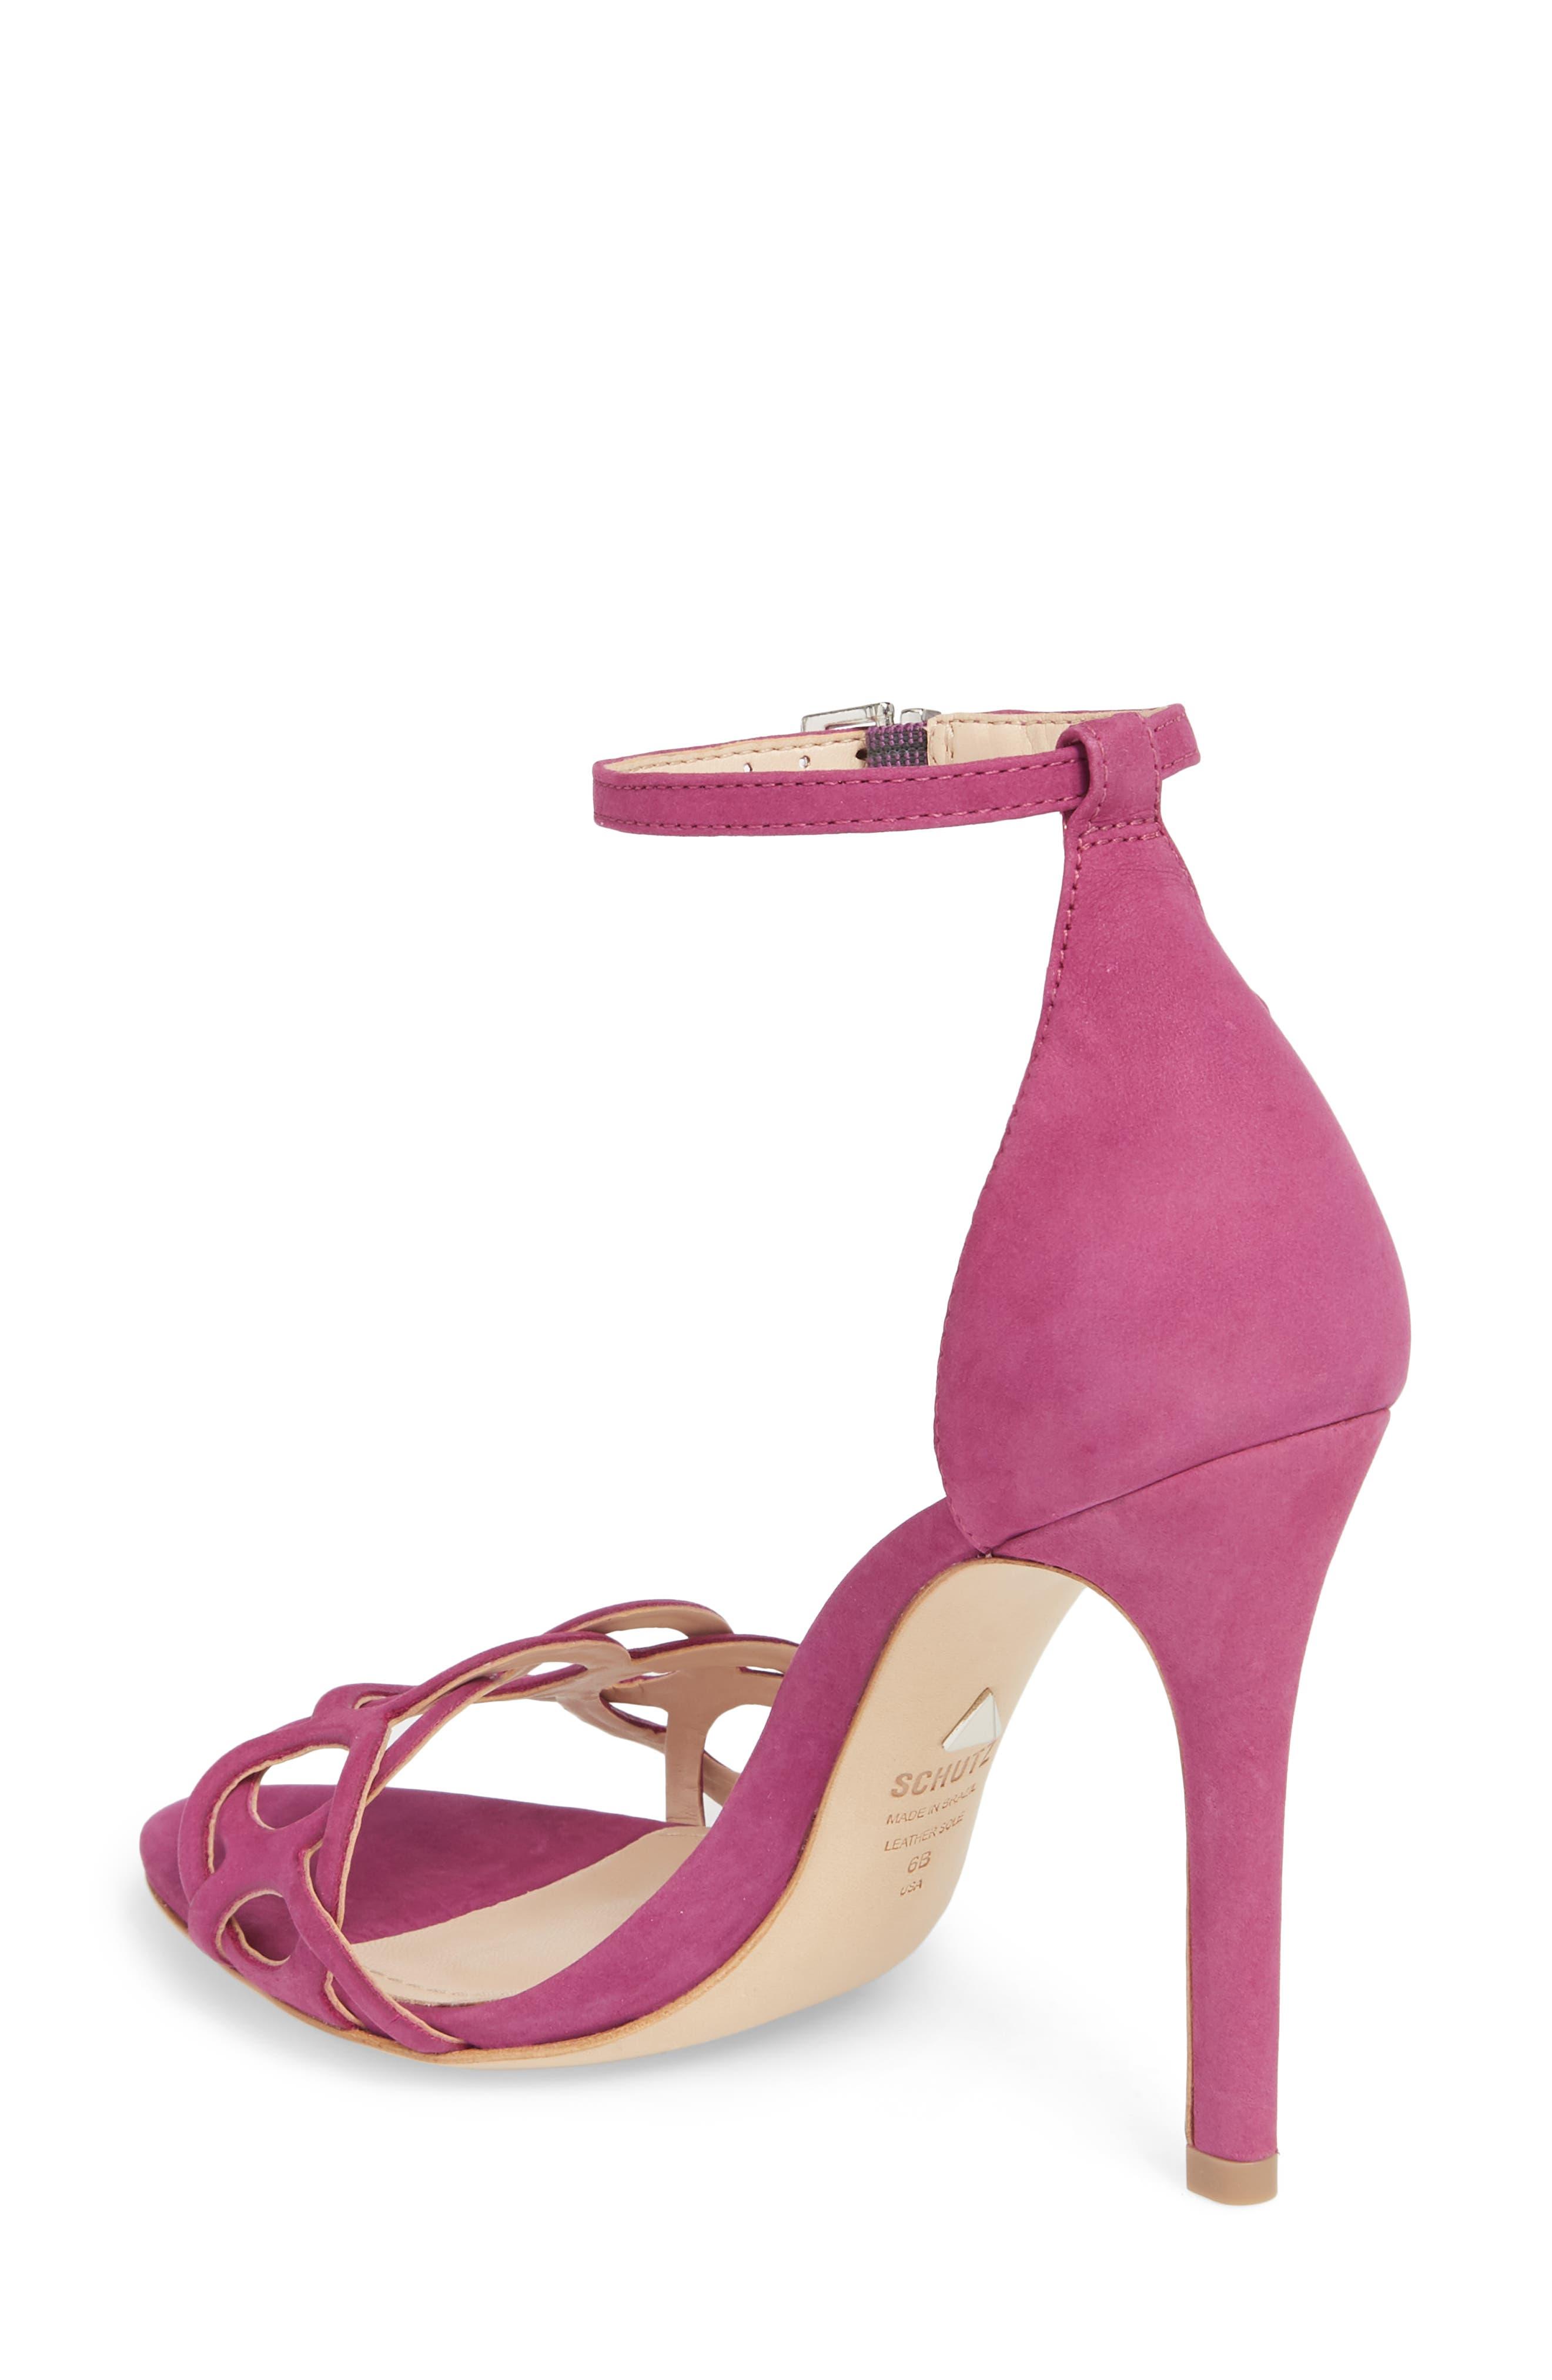 Sthefany Ankle Strap Sandal,                             Alternate thumbnail 2, color,                             Grape Leather